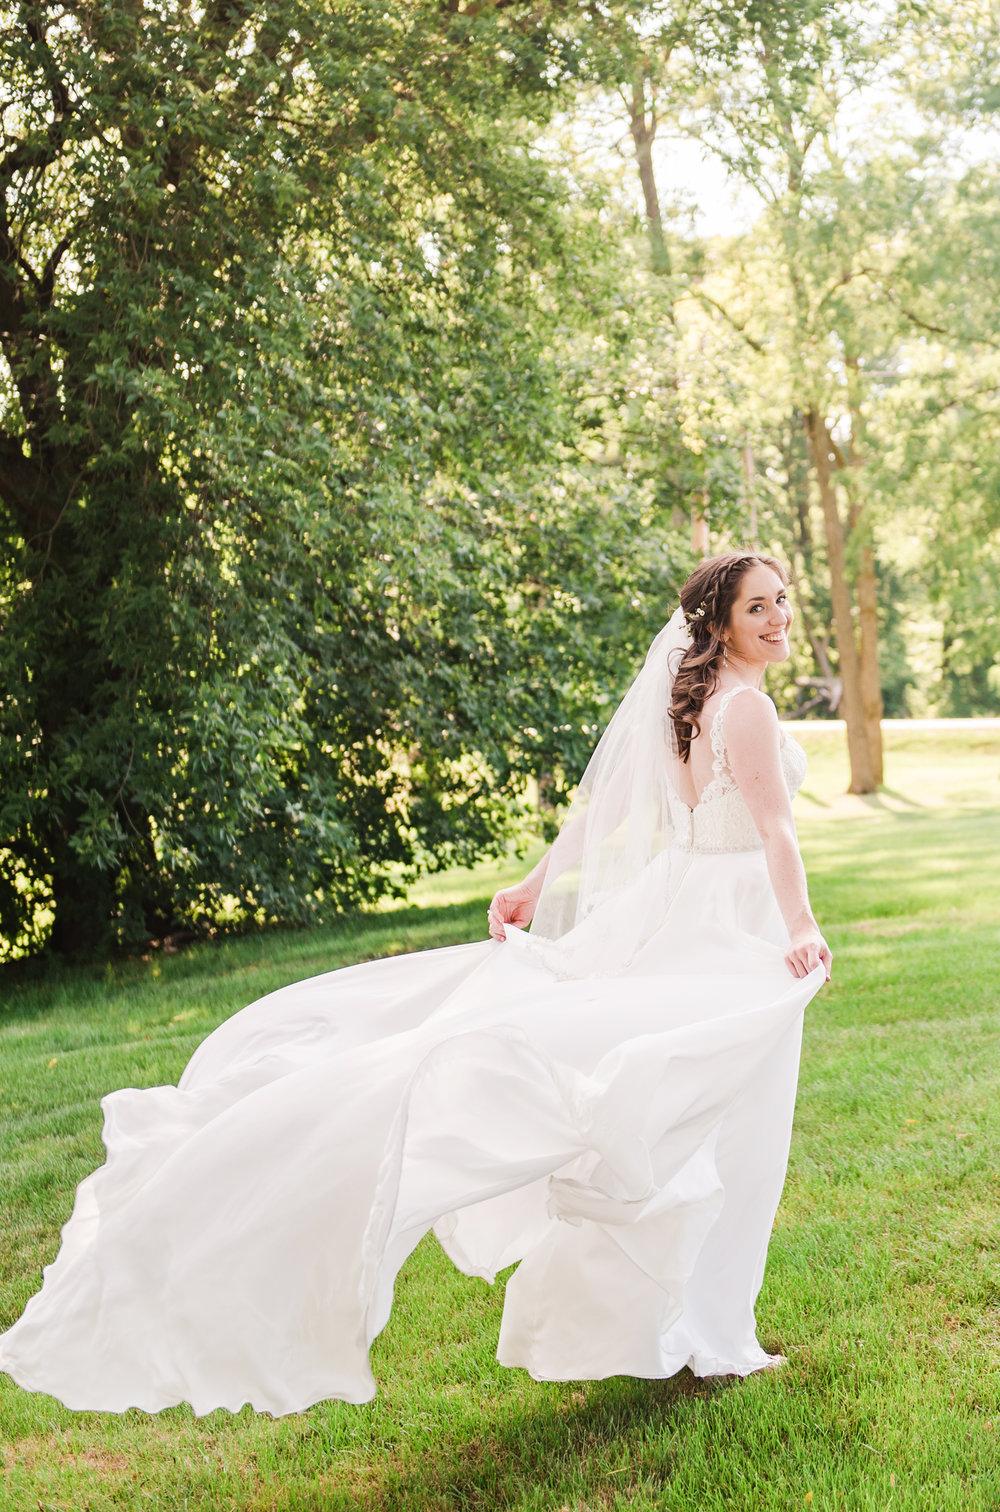 Jerris_Wadsworth_Wedding_Barn_Rochester_Wedding_JILL_STUDIO_Rochester_NY_Photographer_DSC_2755.jpg